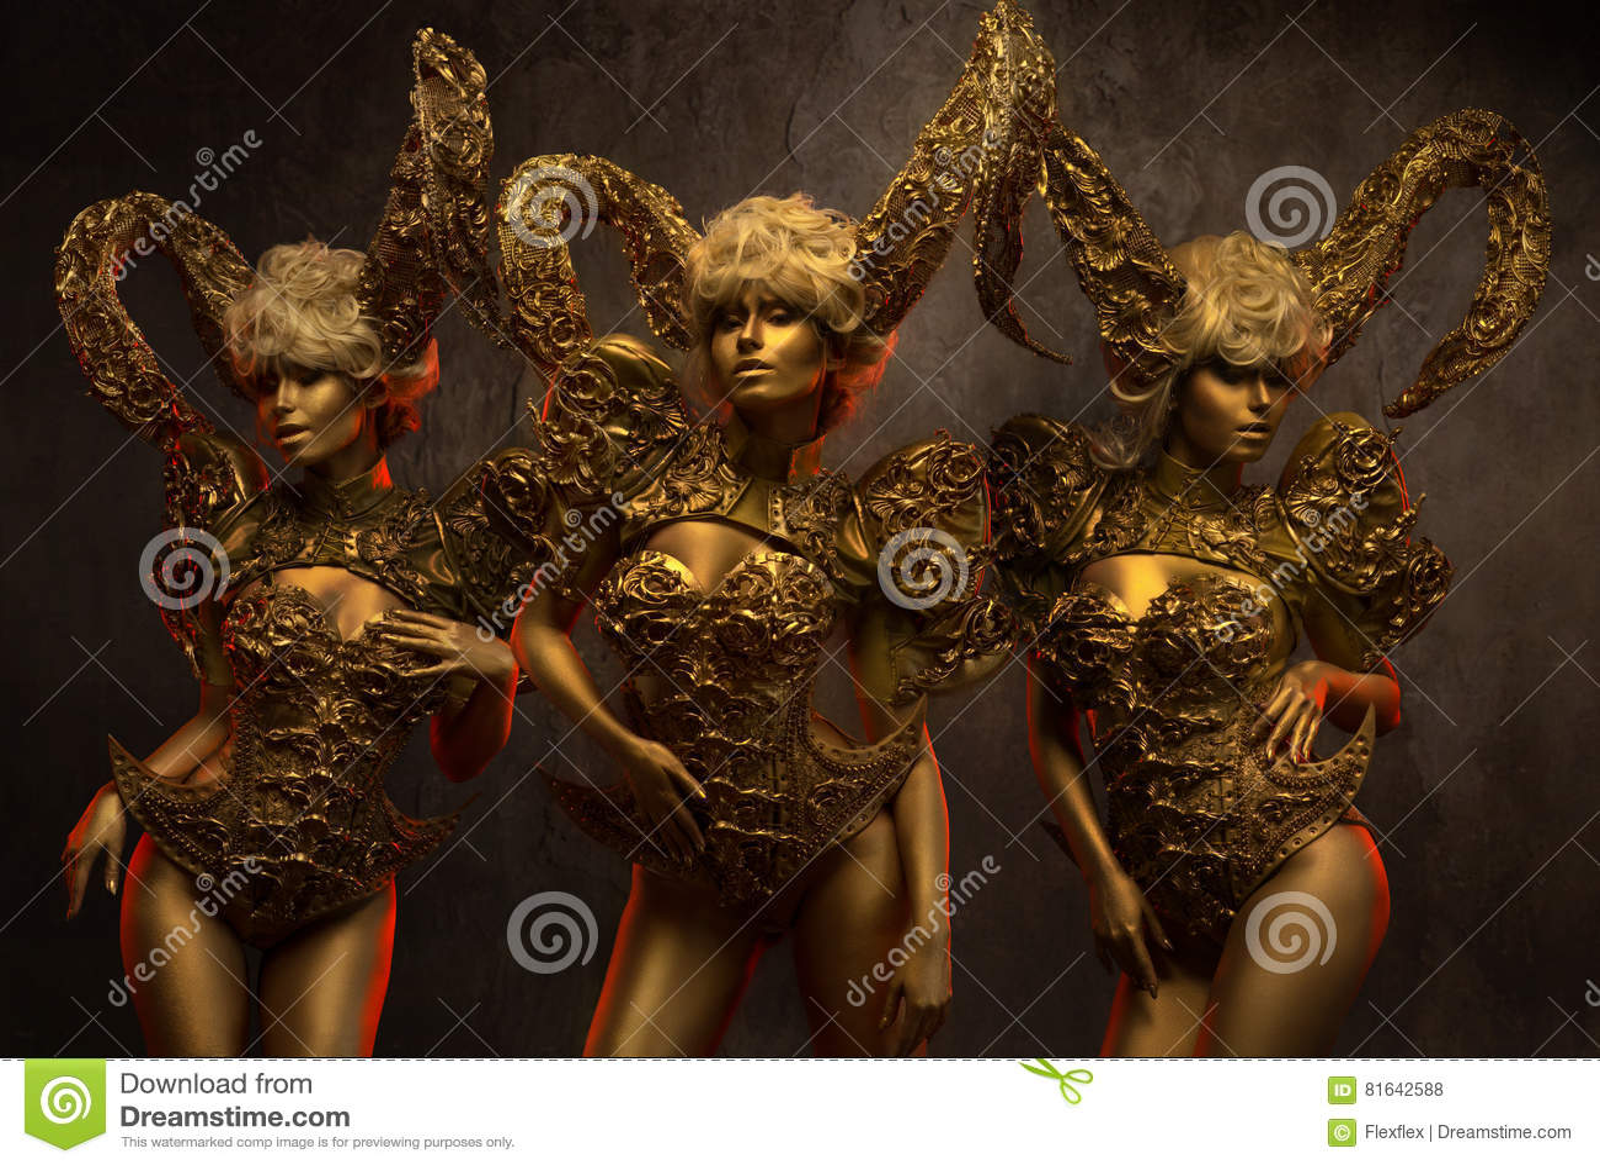 Beautiful devil women with golden ornamental horns